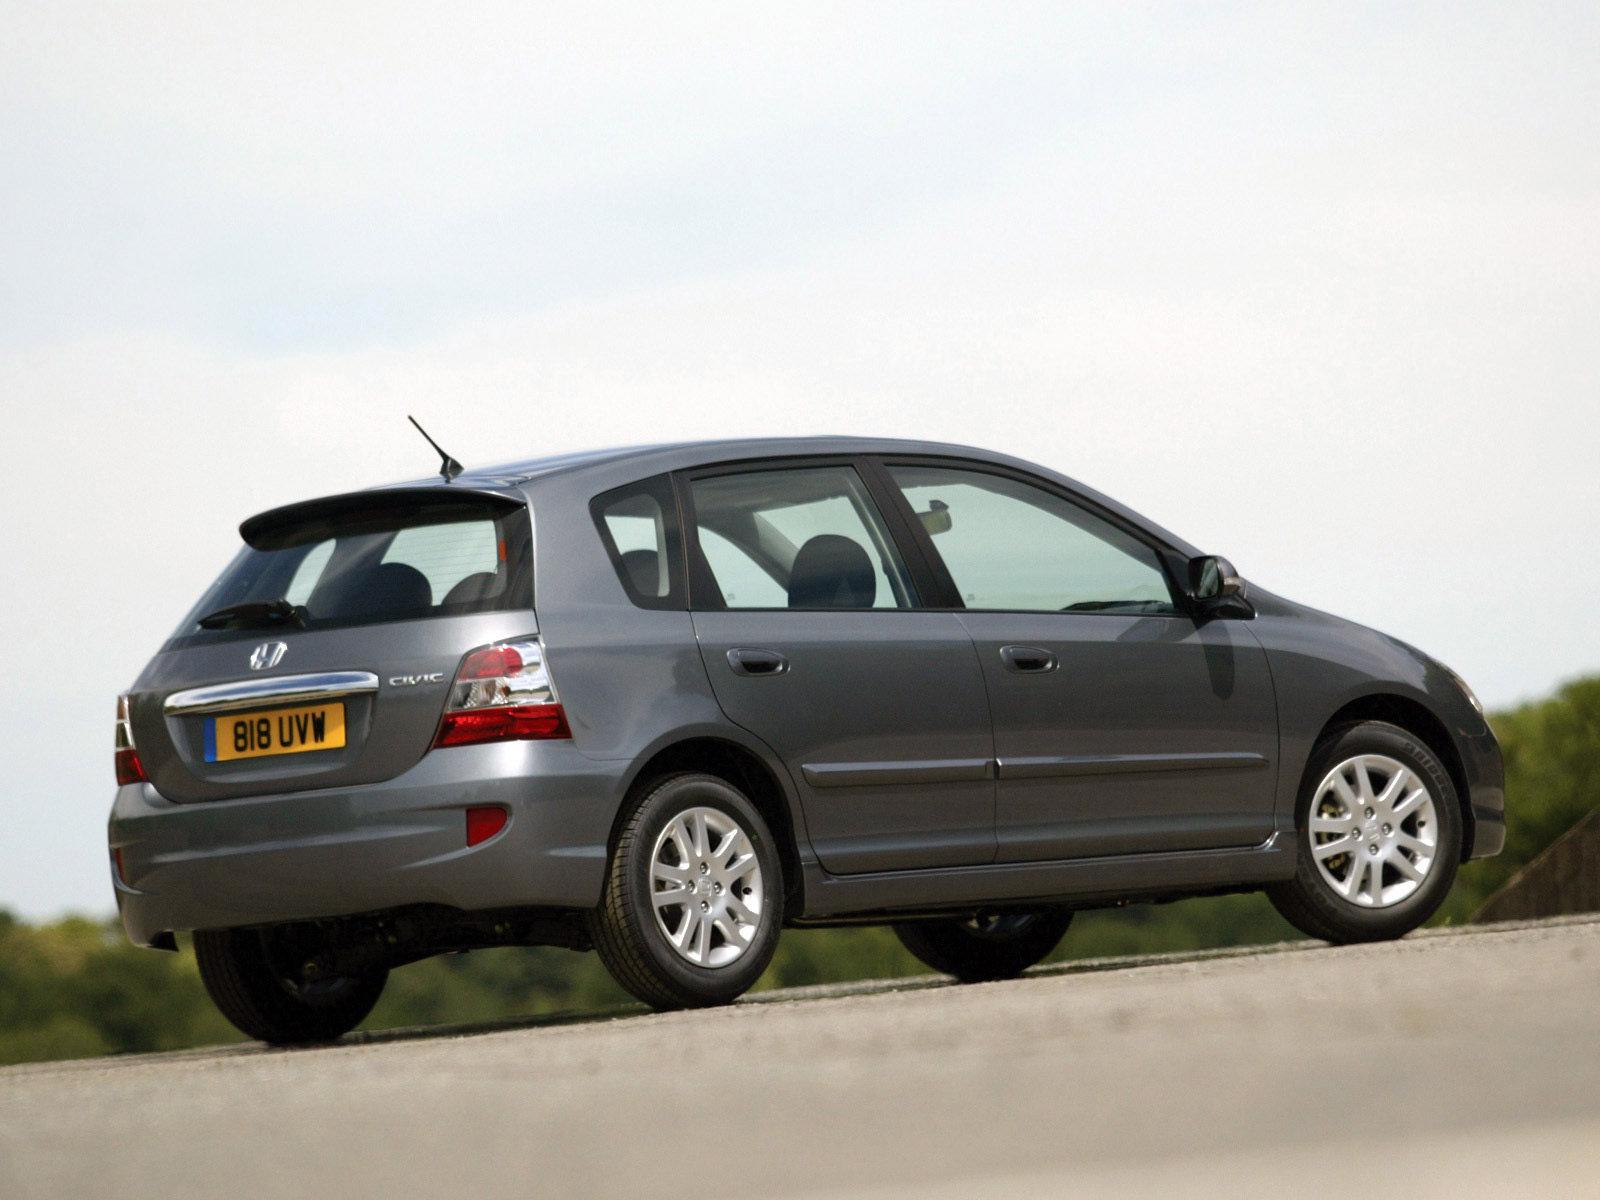 Хонда цивик 2003 фото